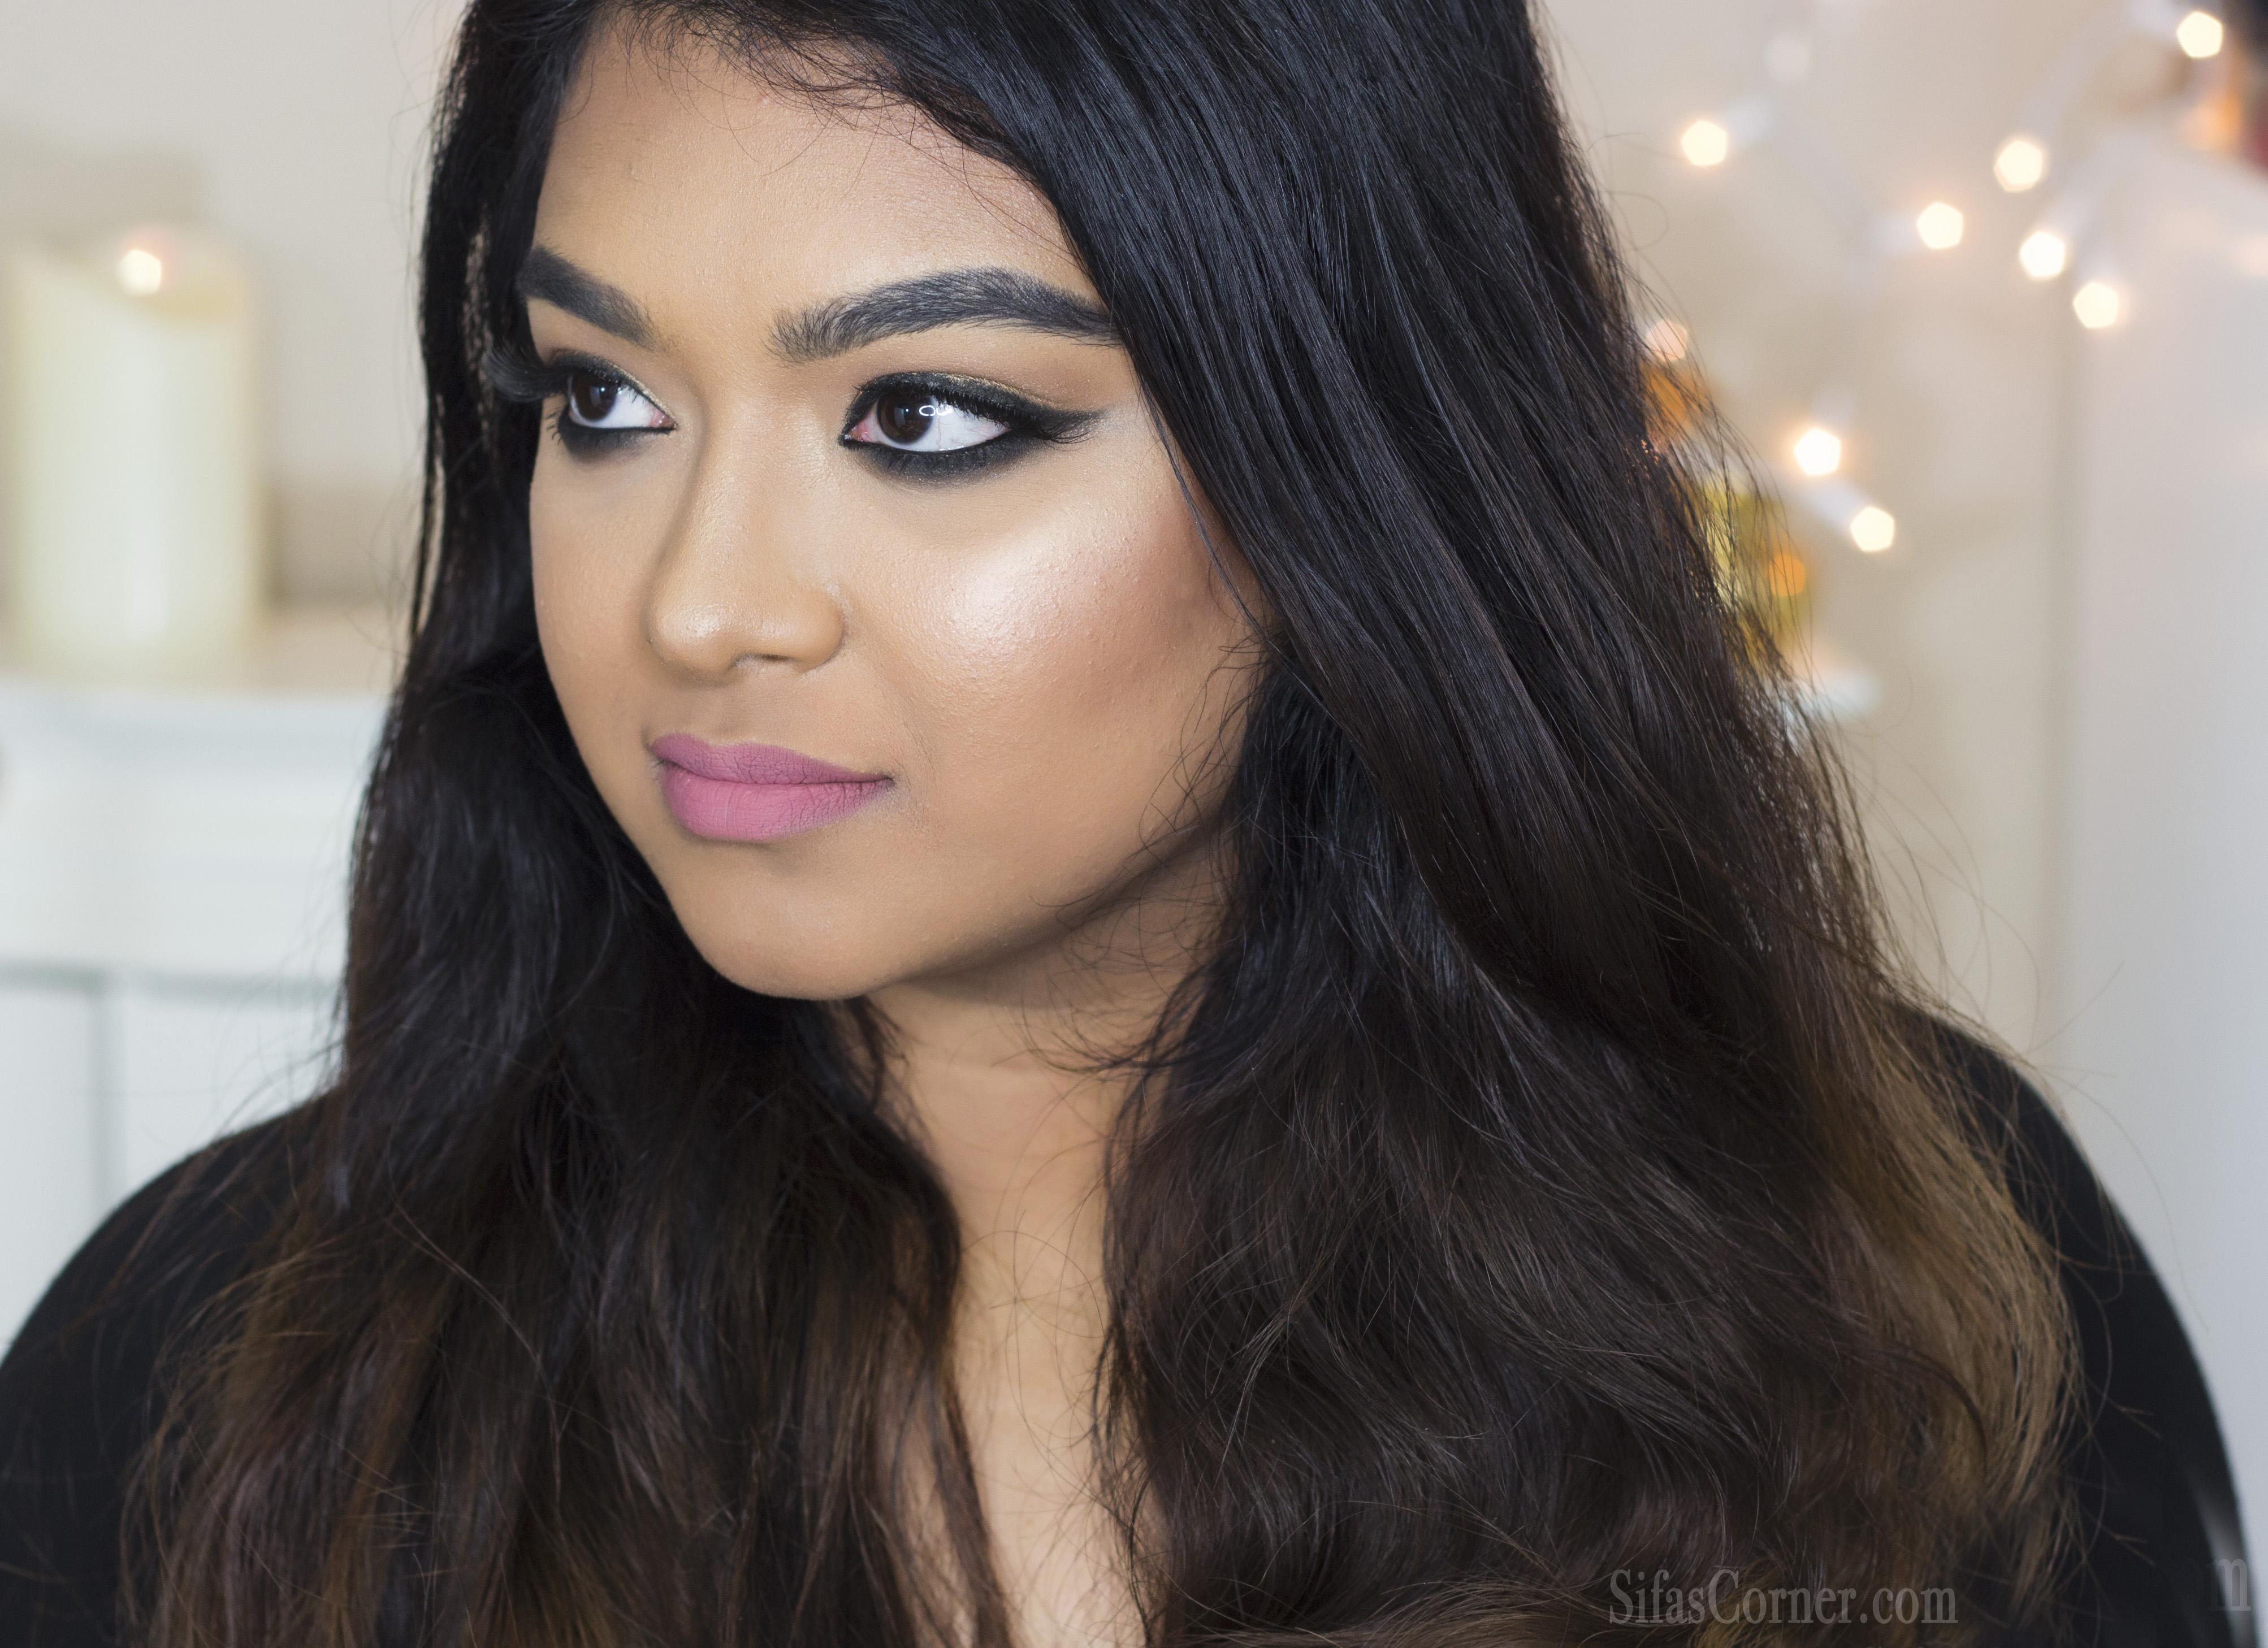 Tutorial: Deepika Padukone RAABTA Makeup & Hair - Sifa's ...  Tutorial: Deepi...